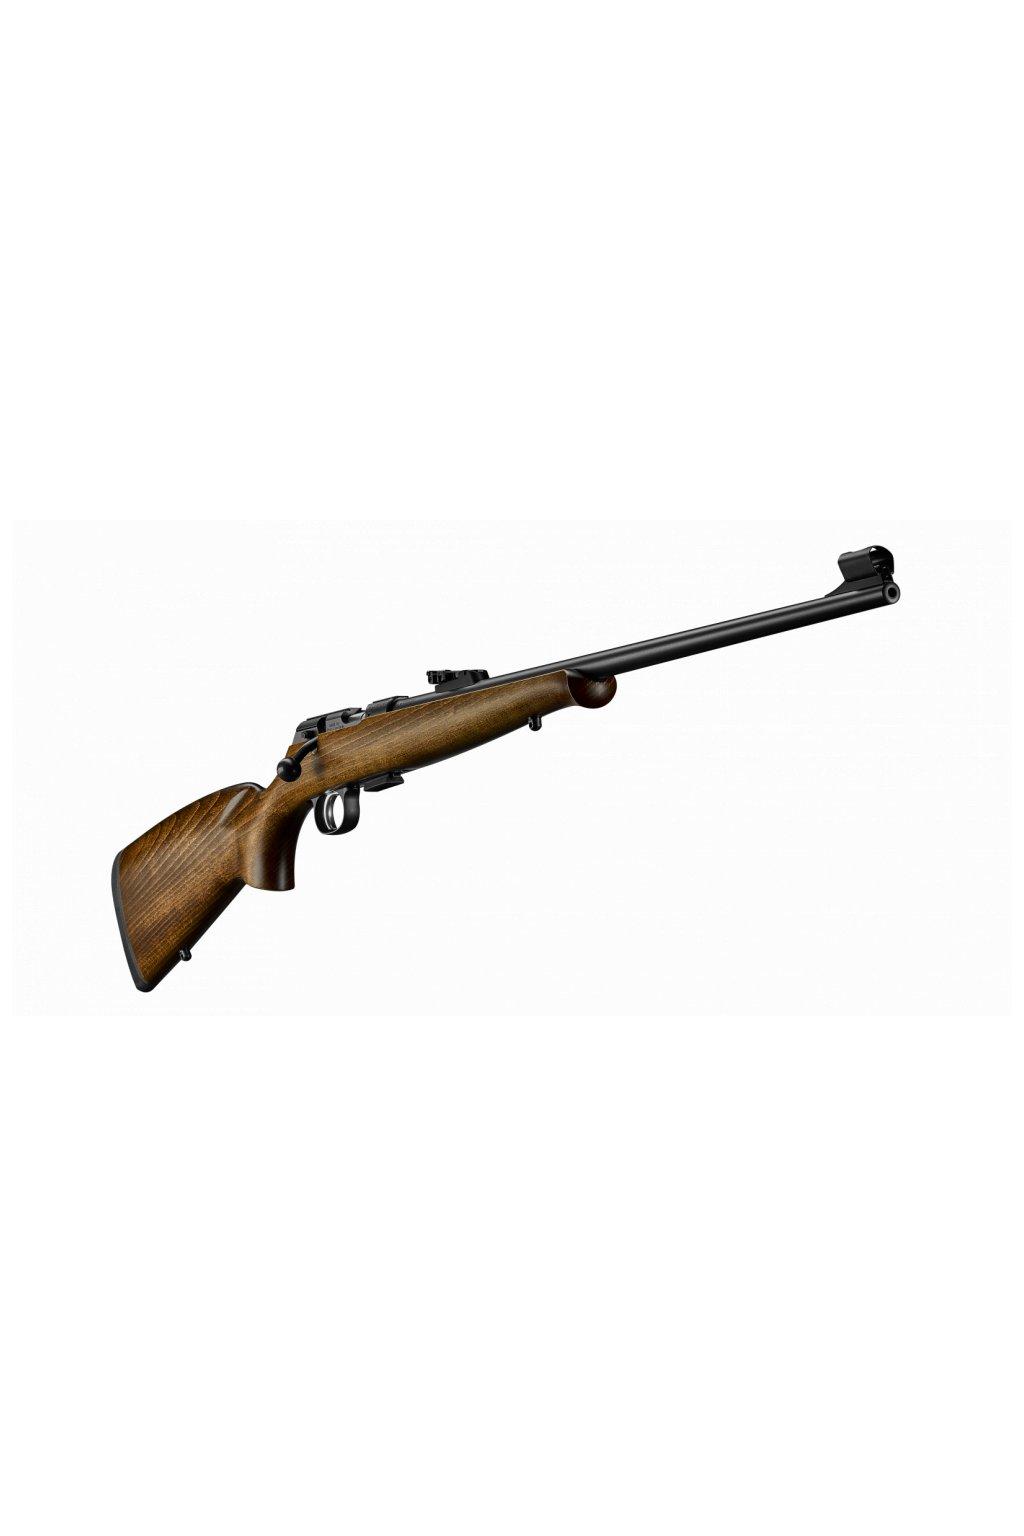 cz 457 training rifle 3d1